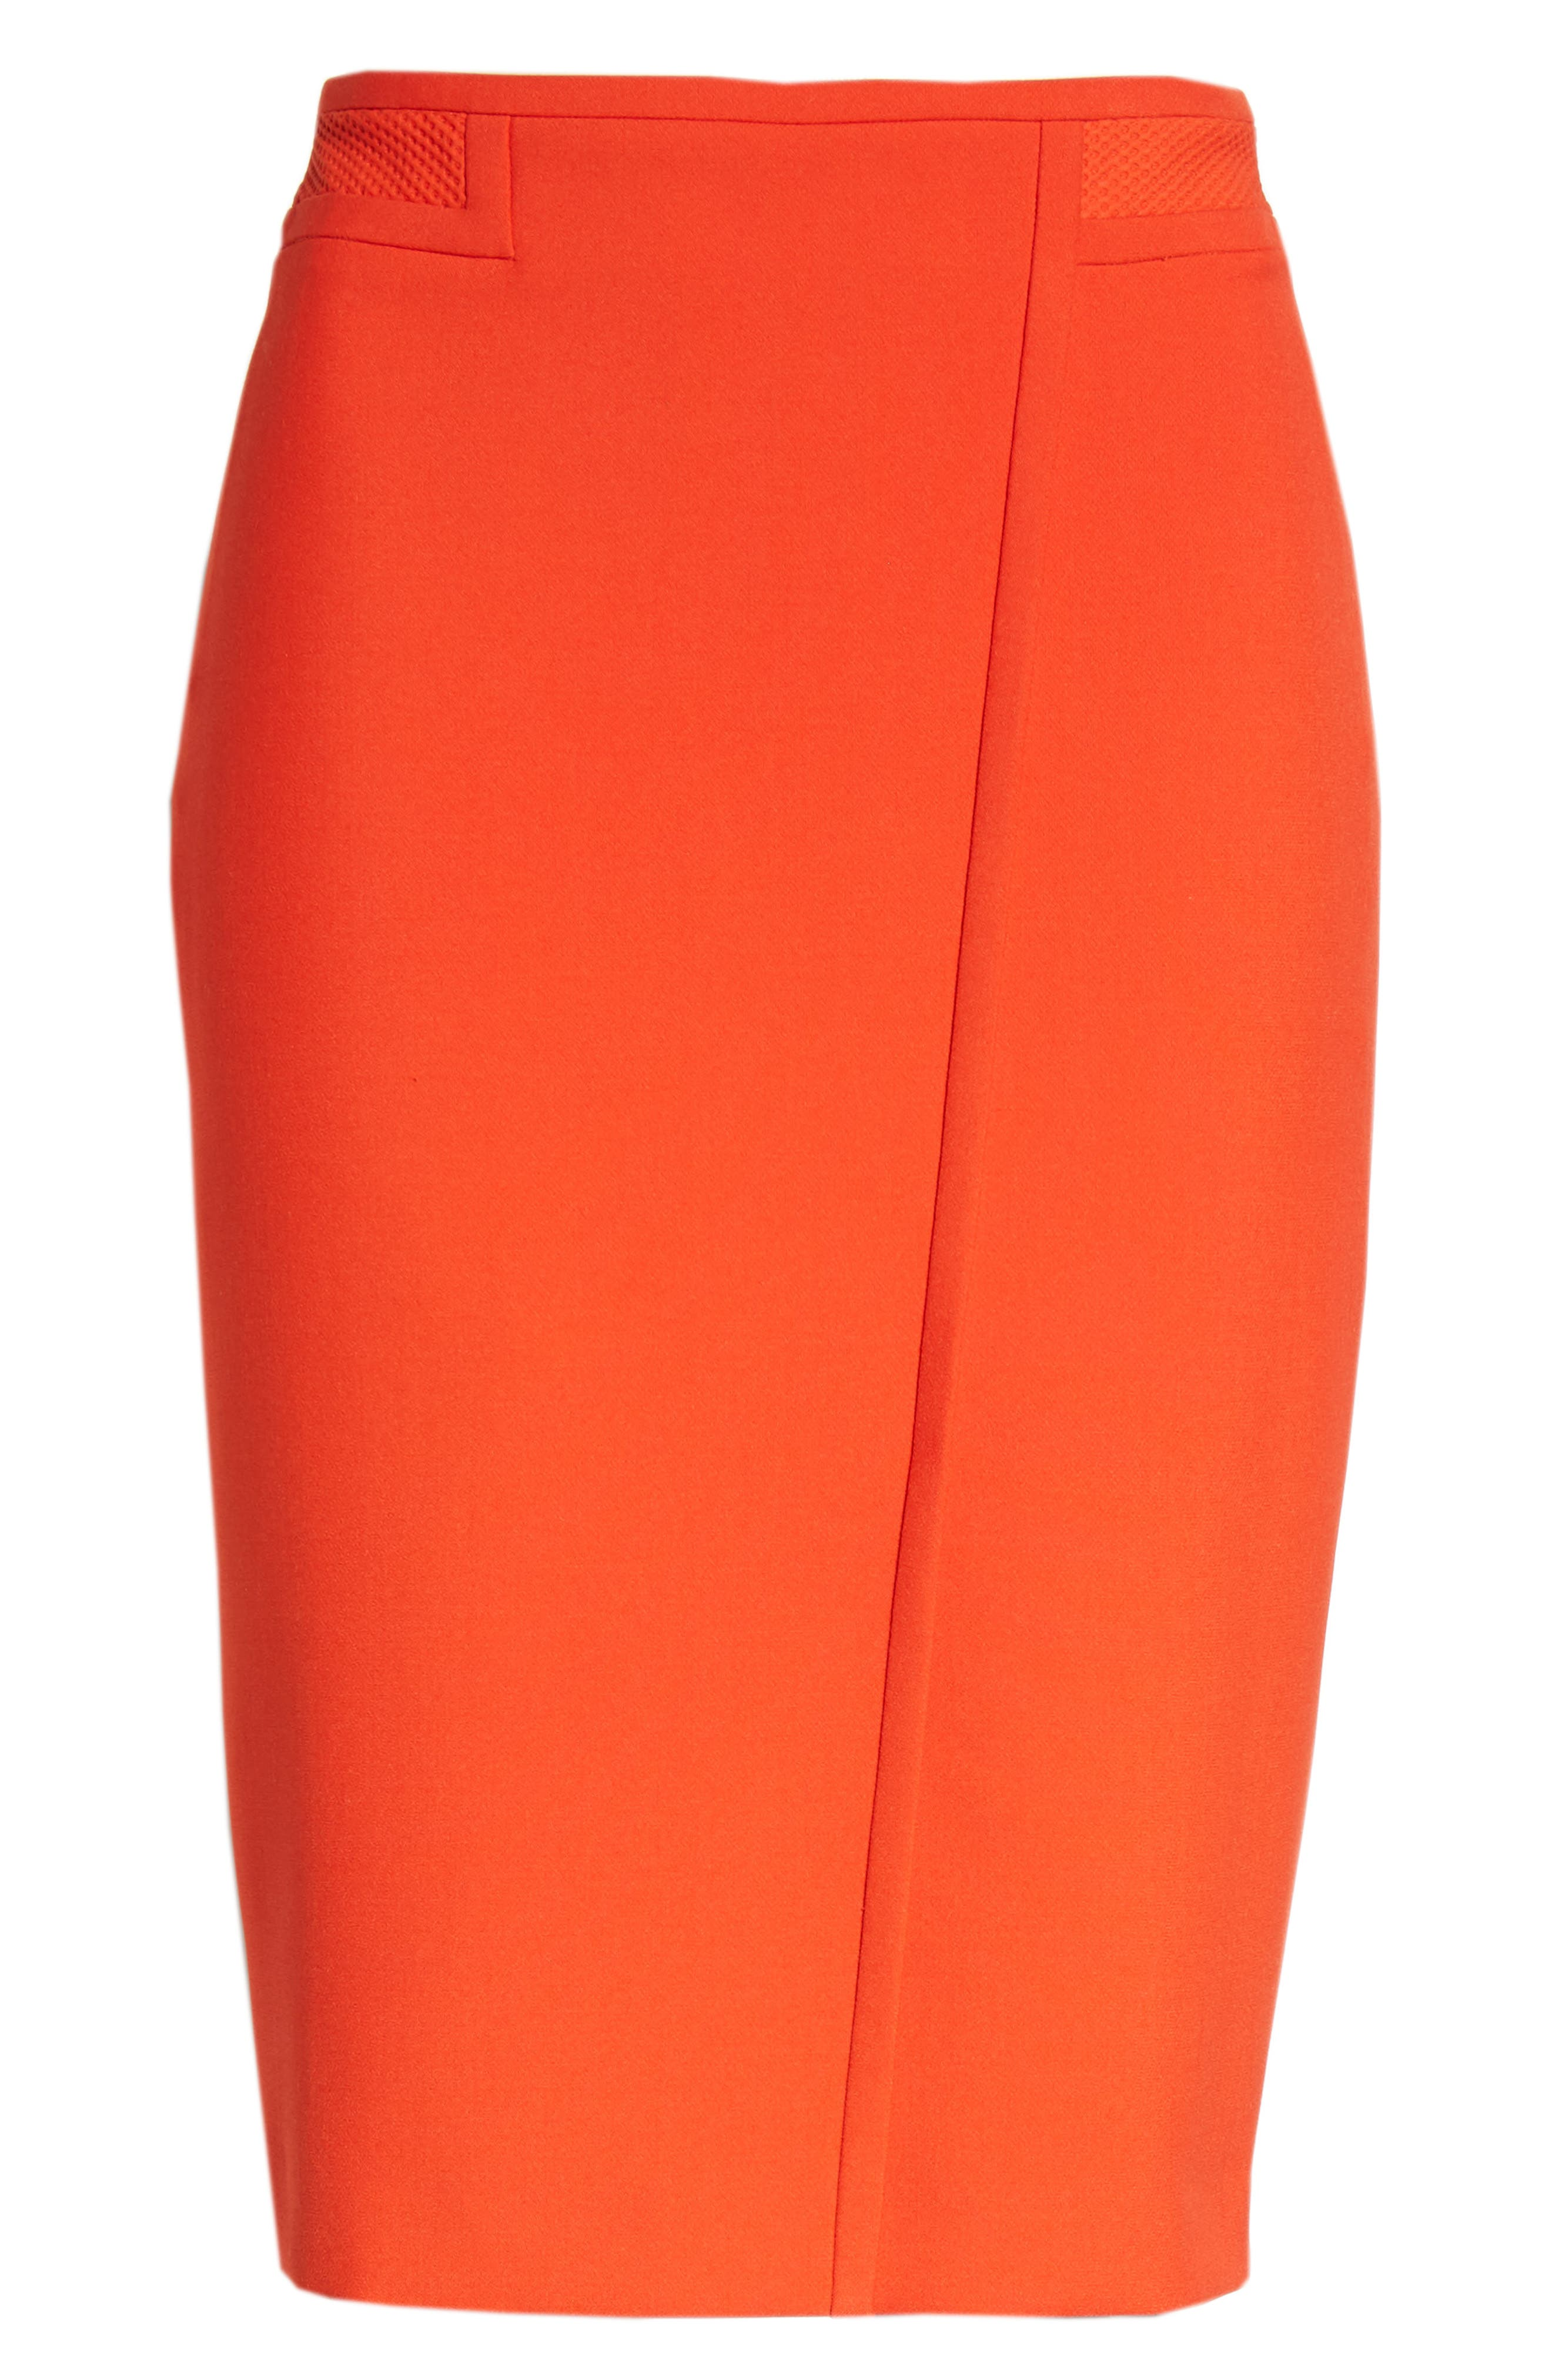 Vadama Ponte Pencil Skirt,                             Alternate thumbnail 6, color,